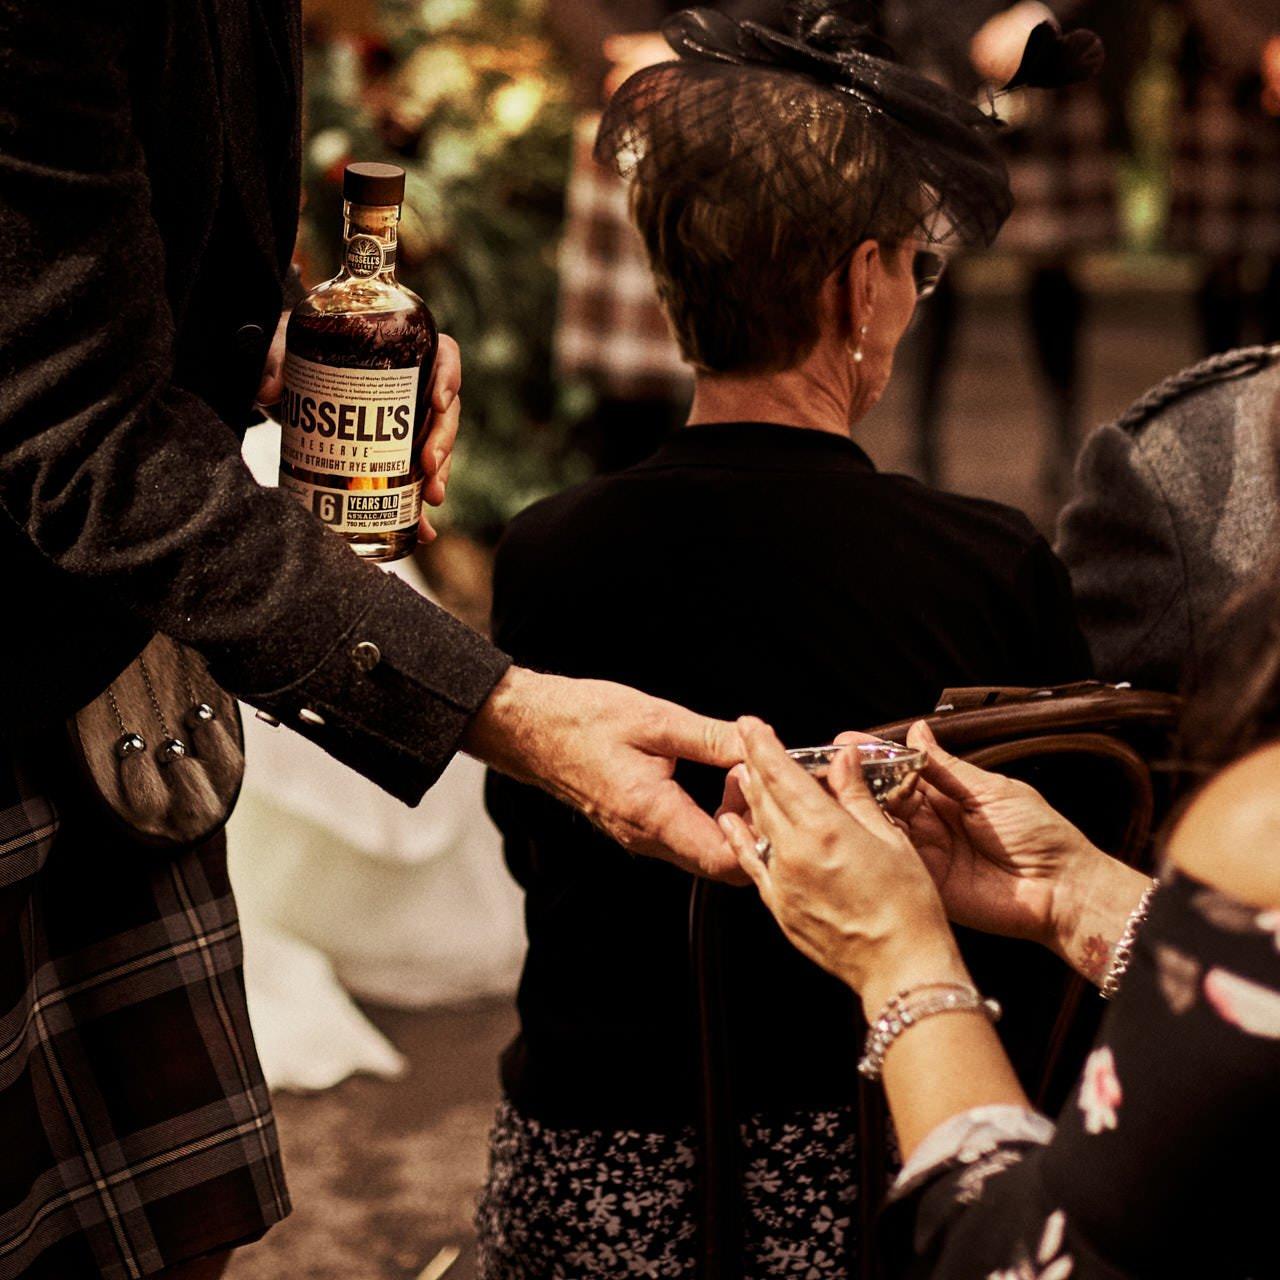 wedding scotland drumtochty castle 046